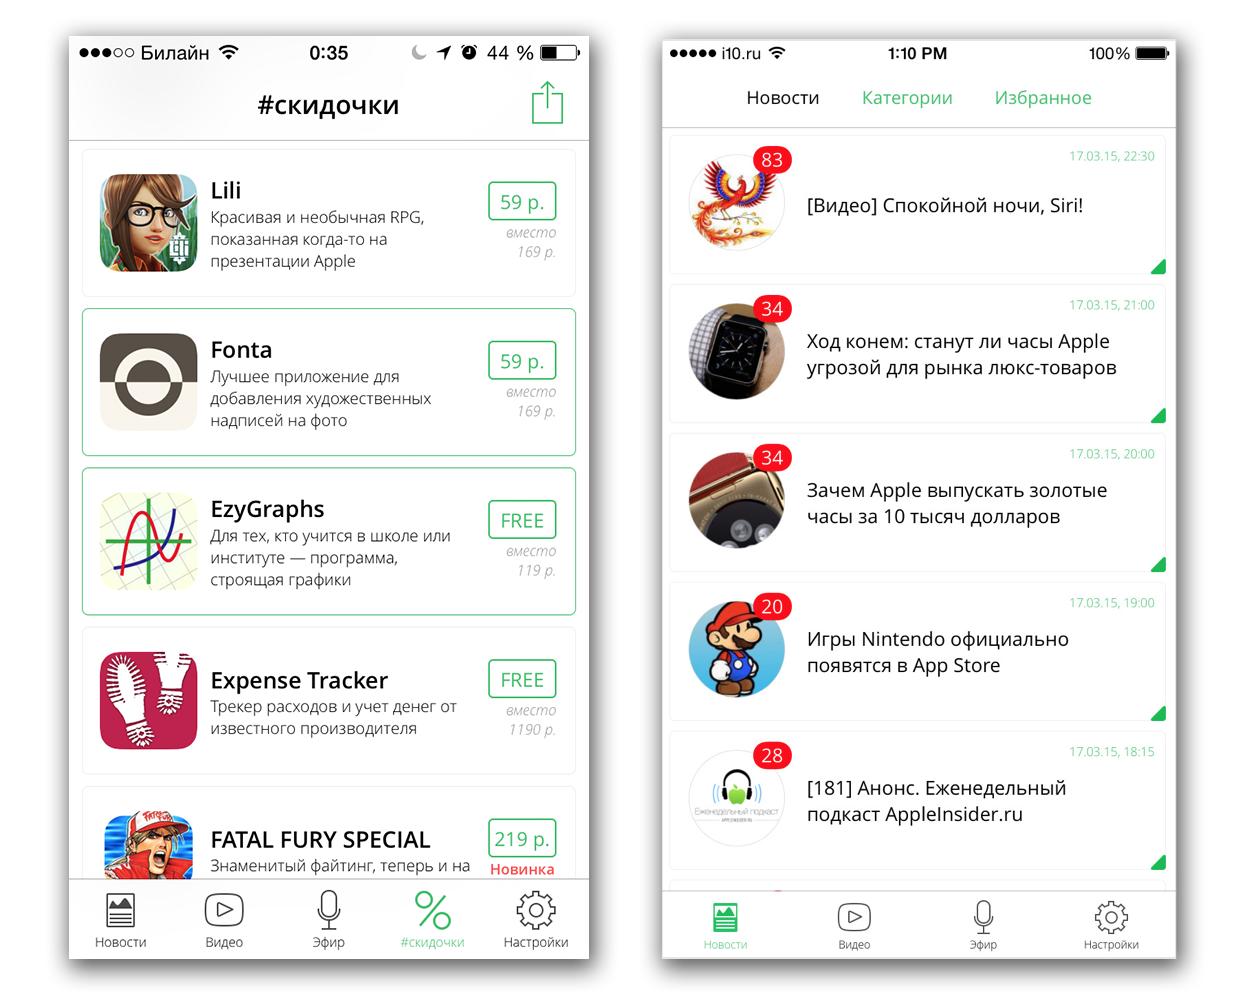 AppleInsider.ru: App Store цензурирует СМИ со слухами про Apple, о конкурентах, о разблочке - 2